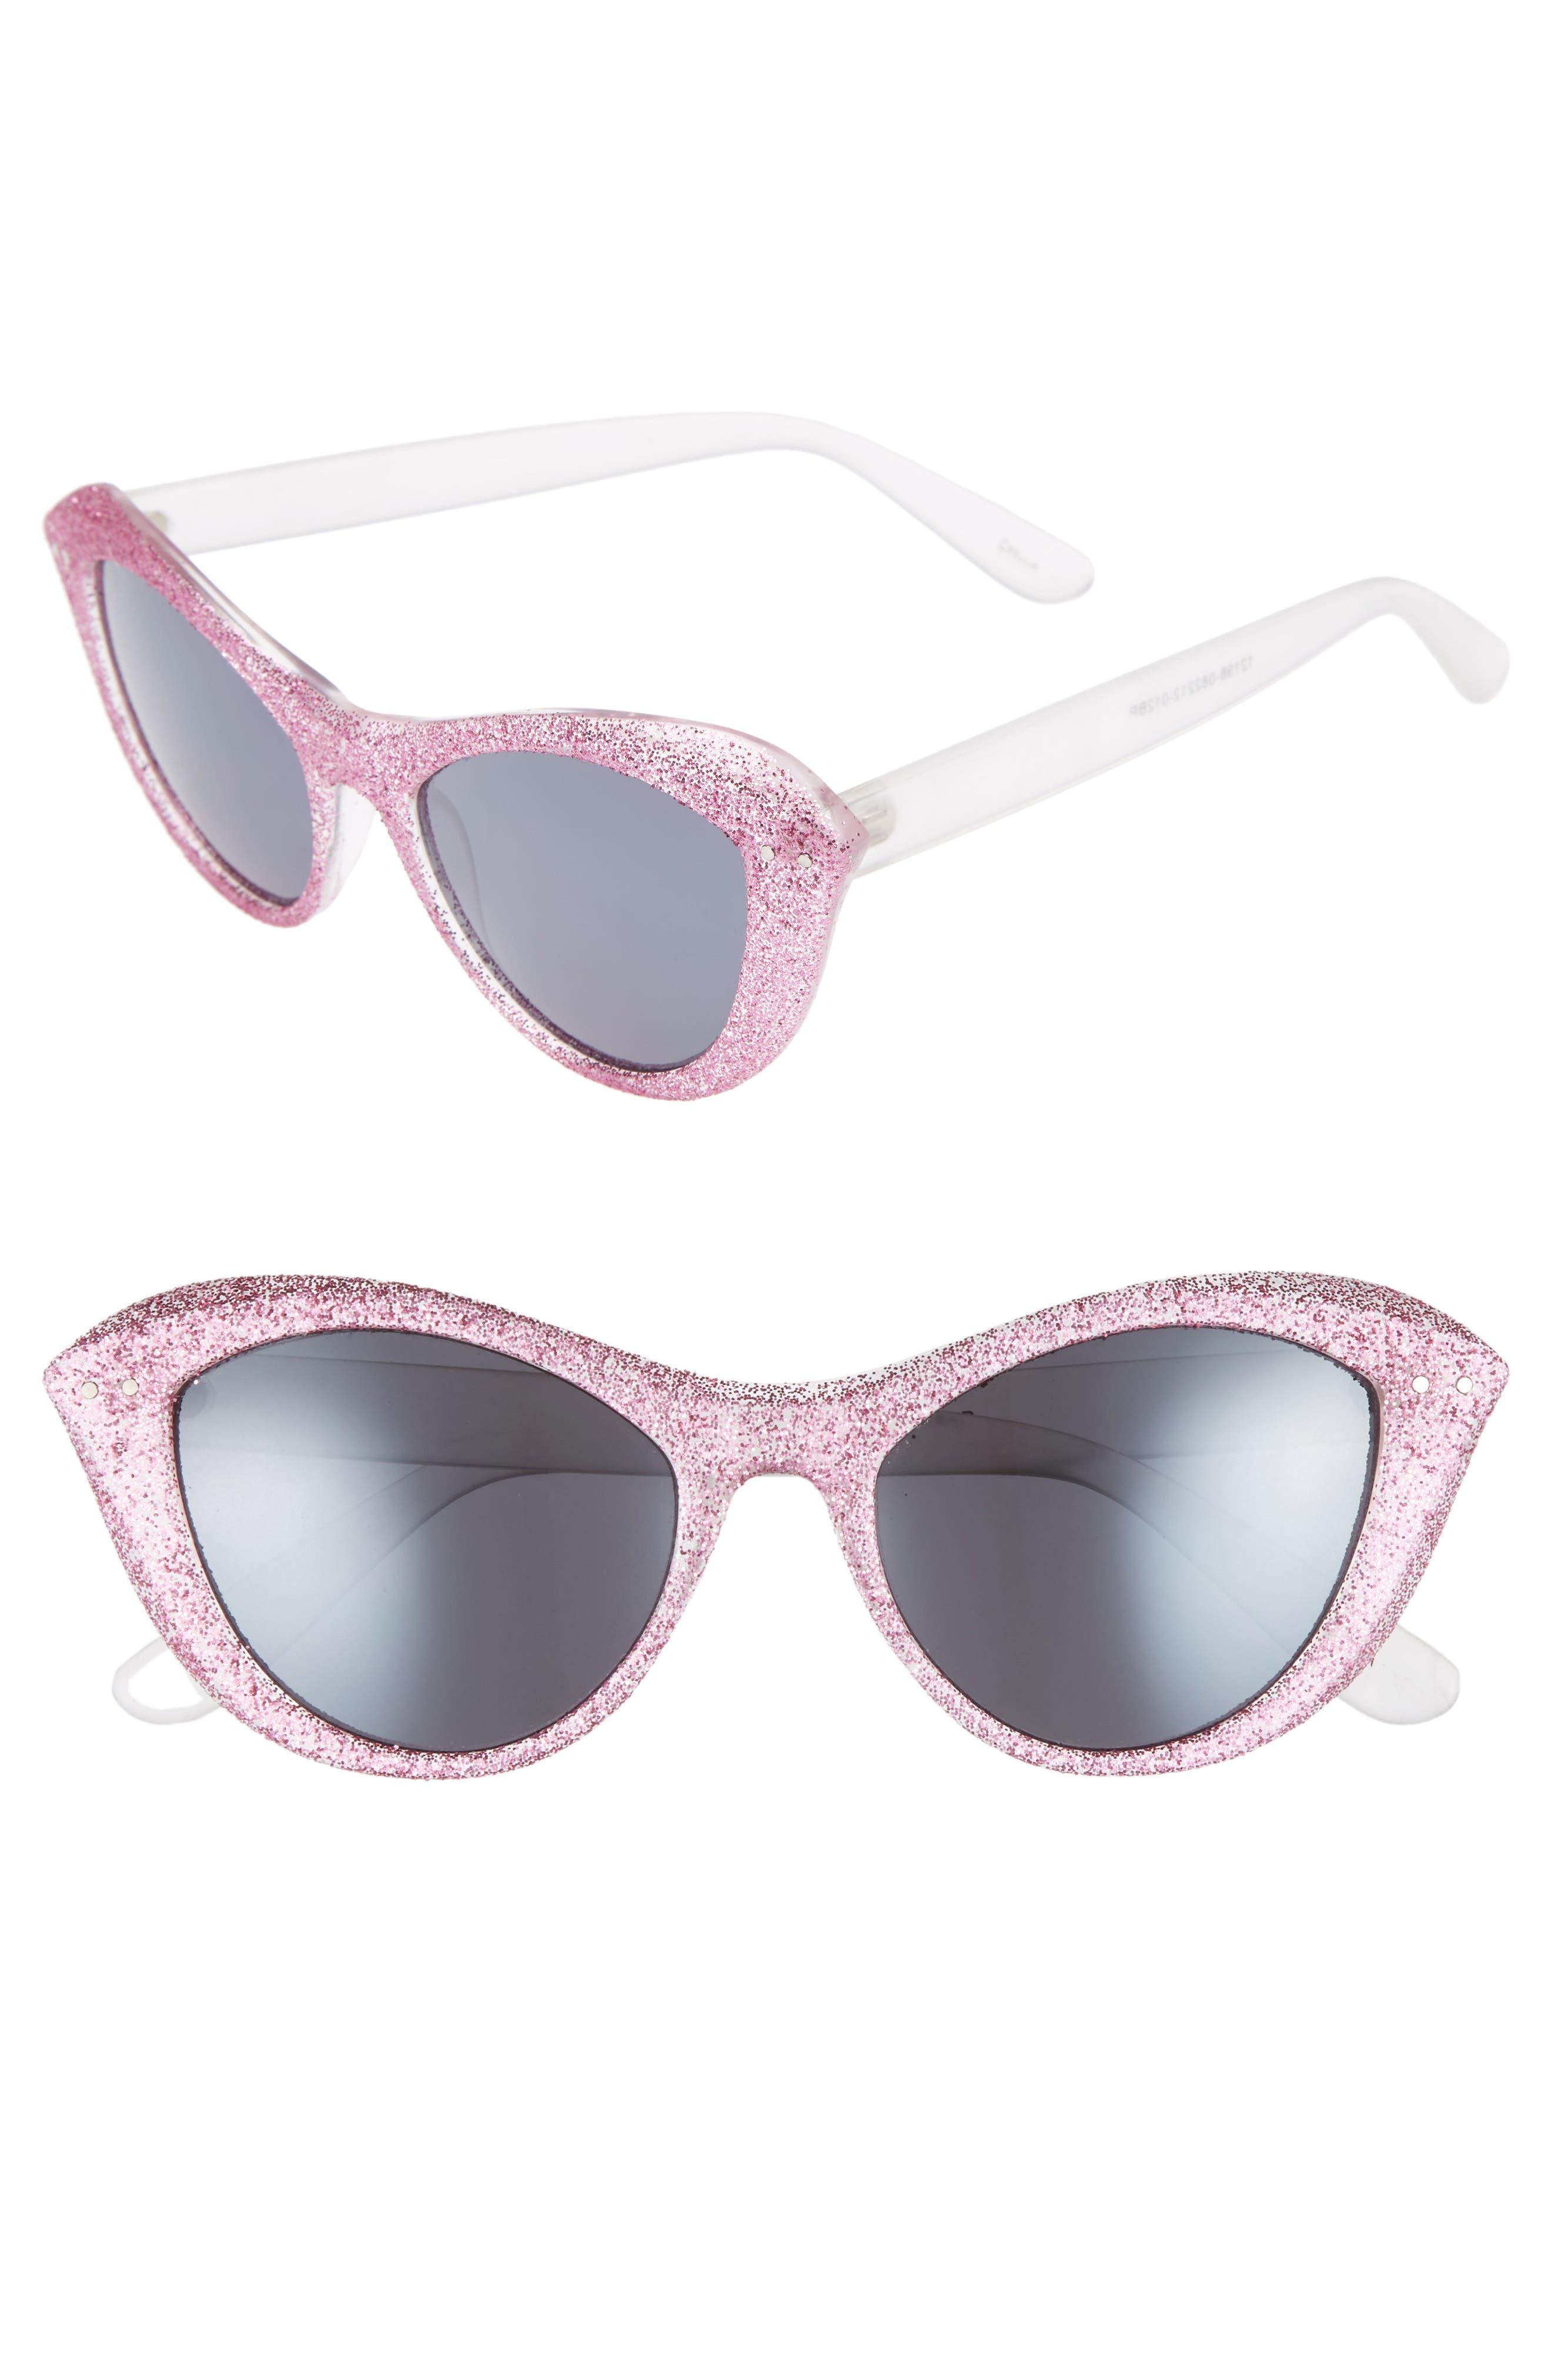 50mm Retro Cat Eye Sunglasses,                         Main,                         color, Milky White/ Pink